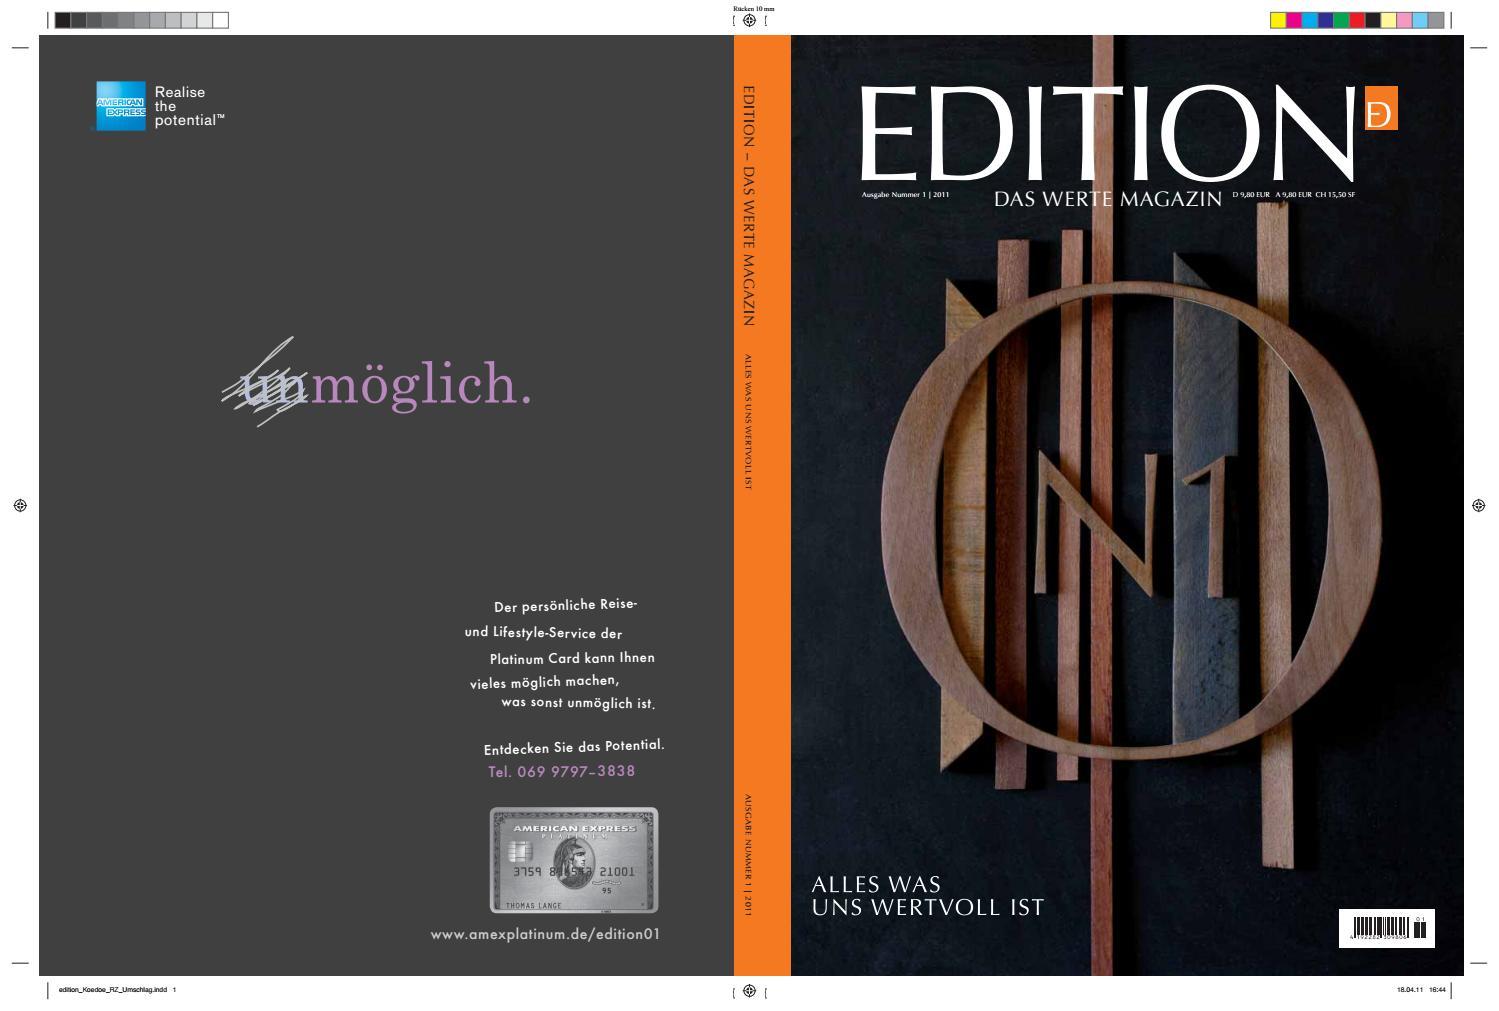 Edition Magazin 1 By Premium Media Gmbh A Company By Kd